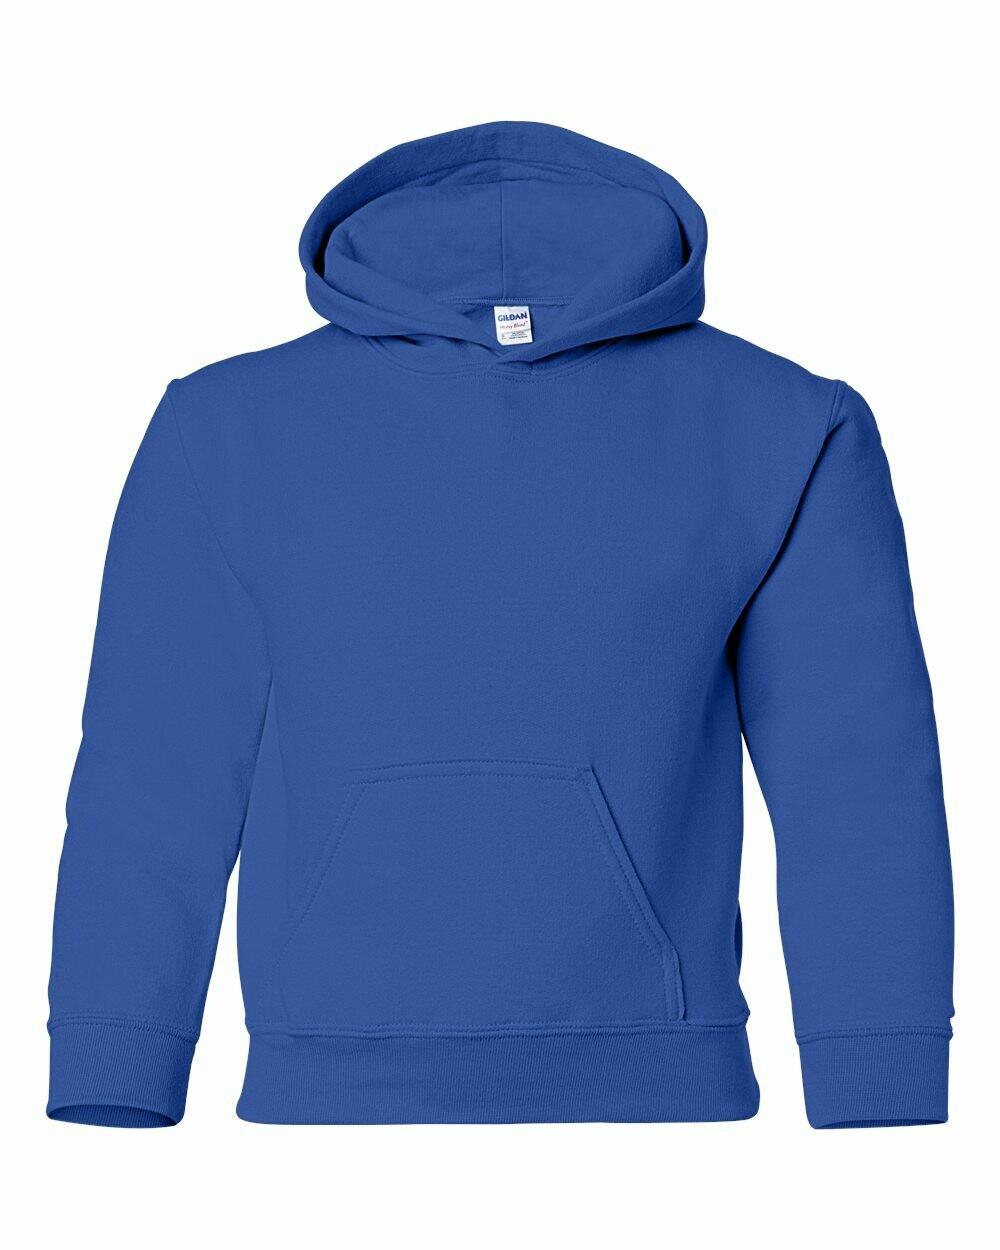 Youth Gildan Heavy Blend Hooded Sweatshirt - (LPCS)